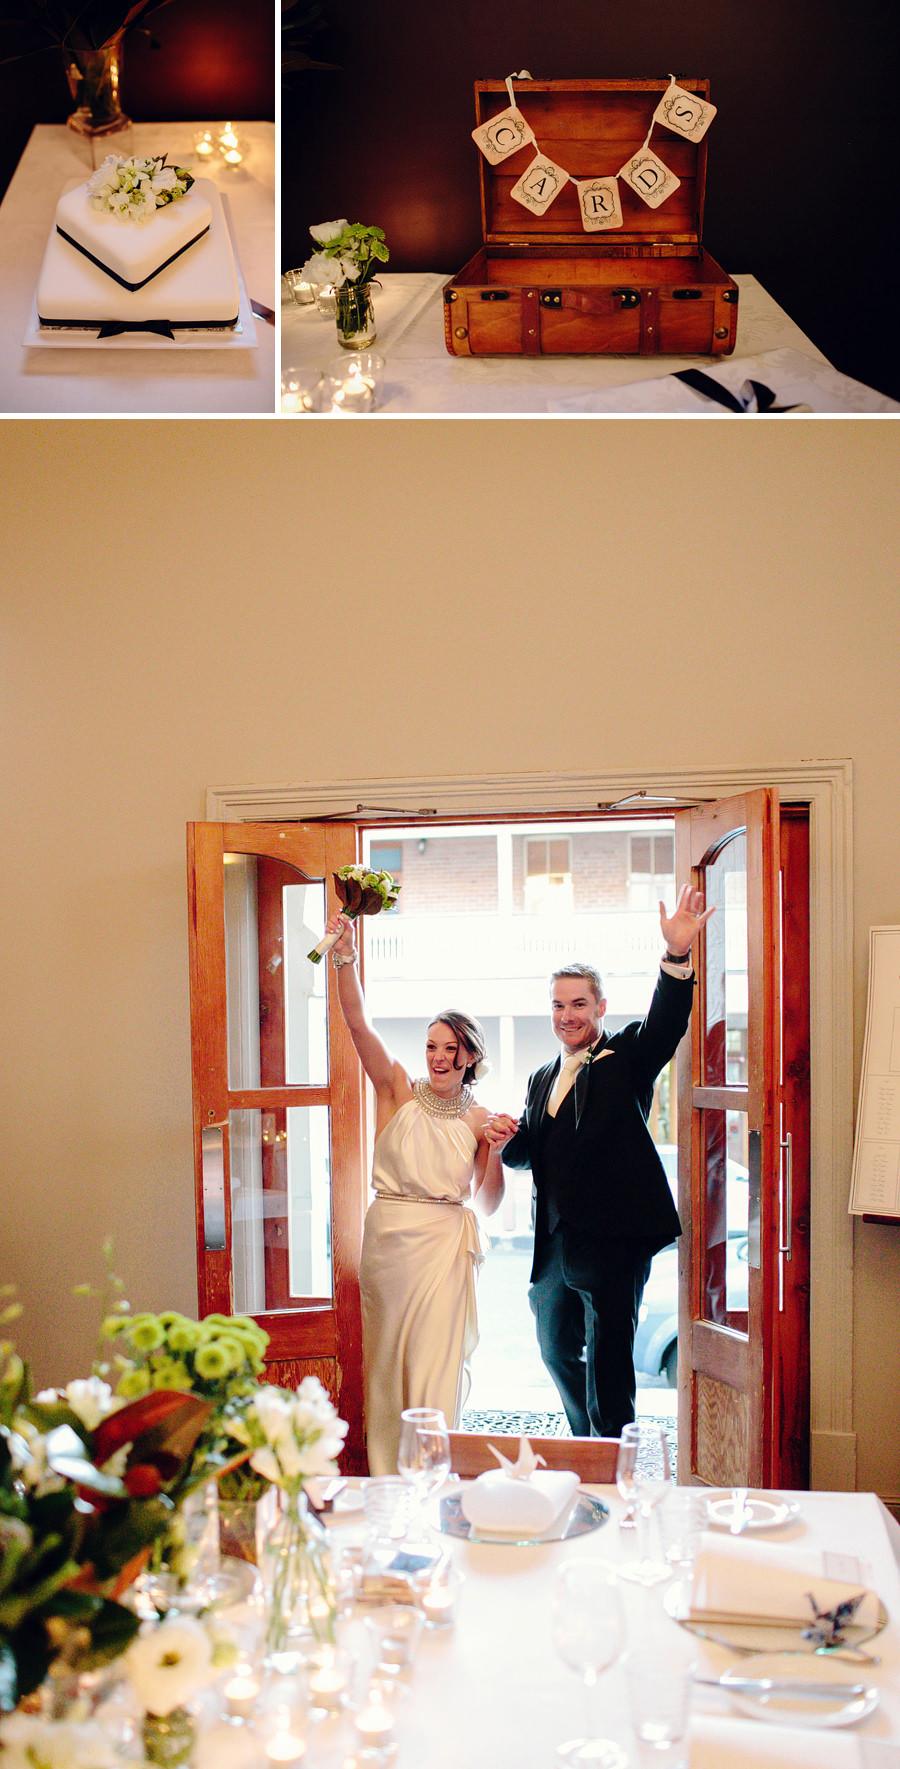 Tonic Millthorpe Wedding Photographer: Reception